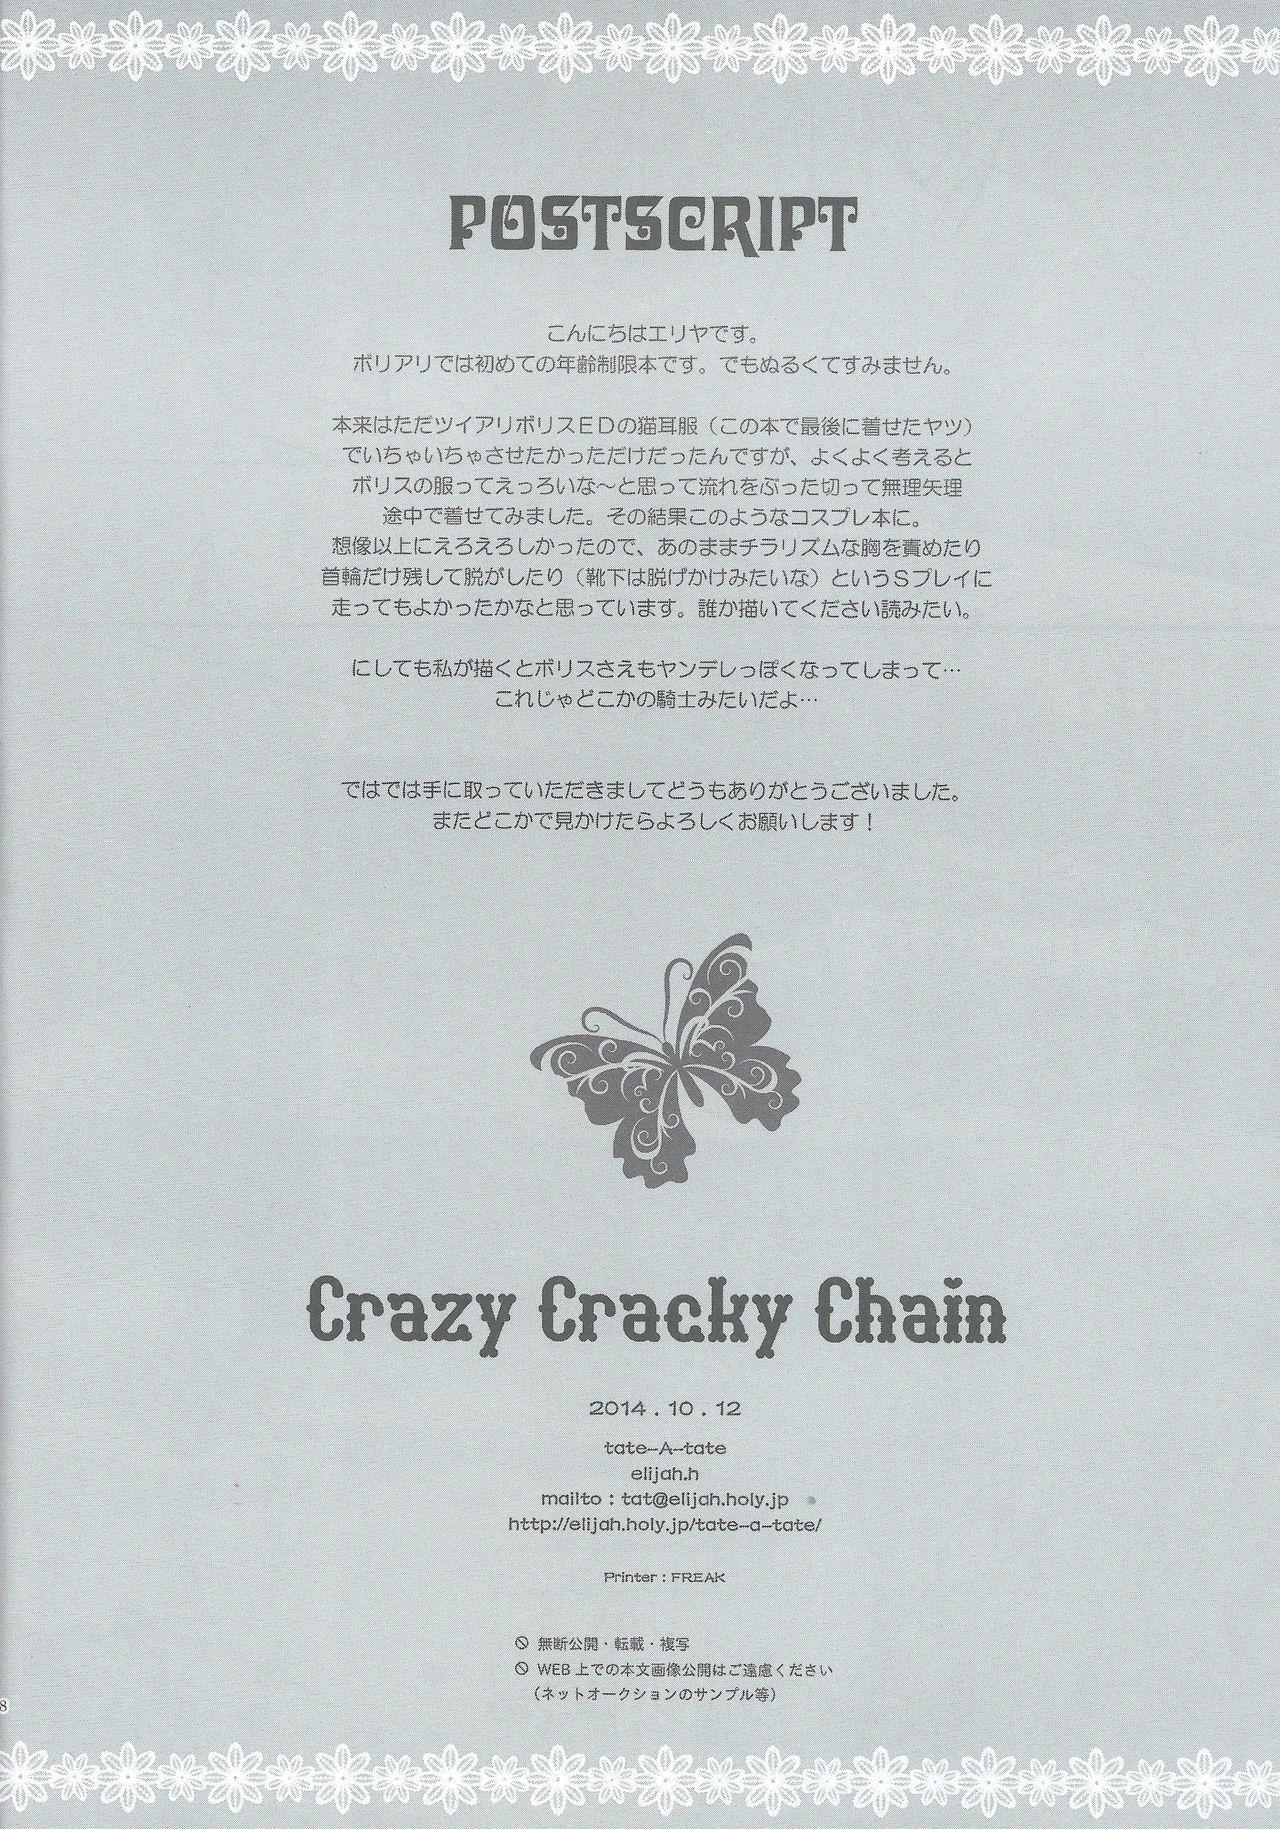 Crazy Cracky Chain 15